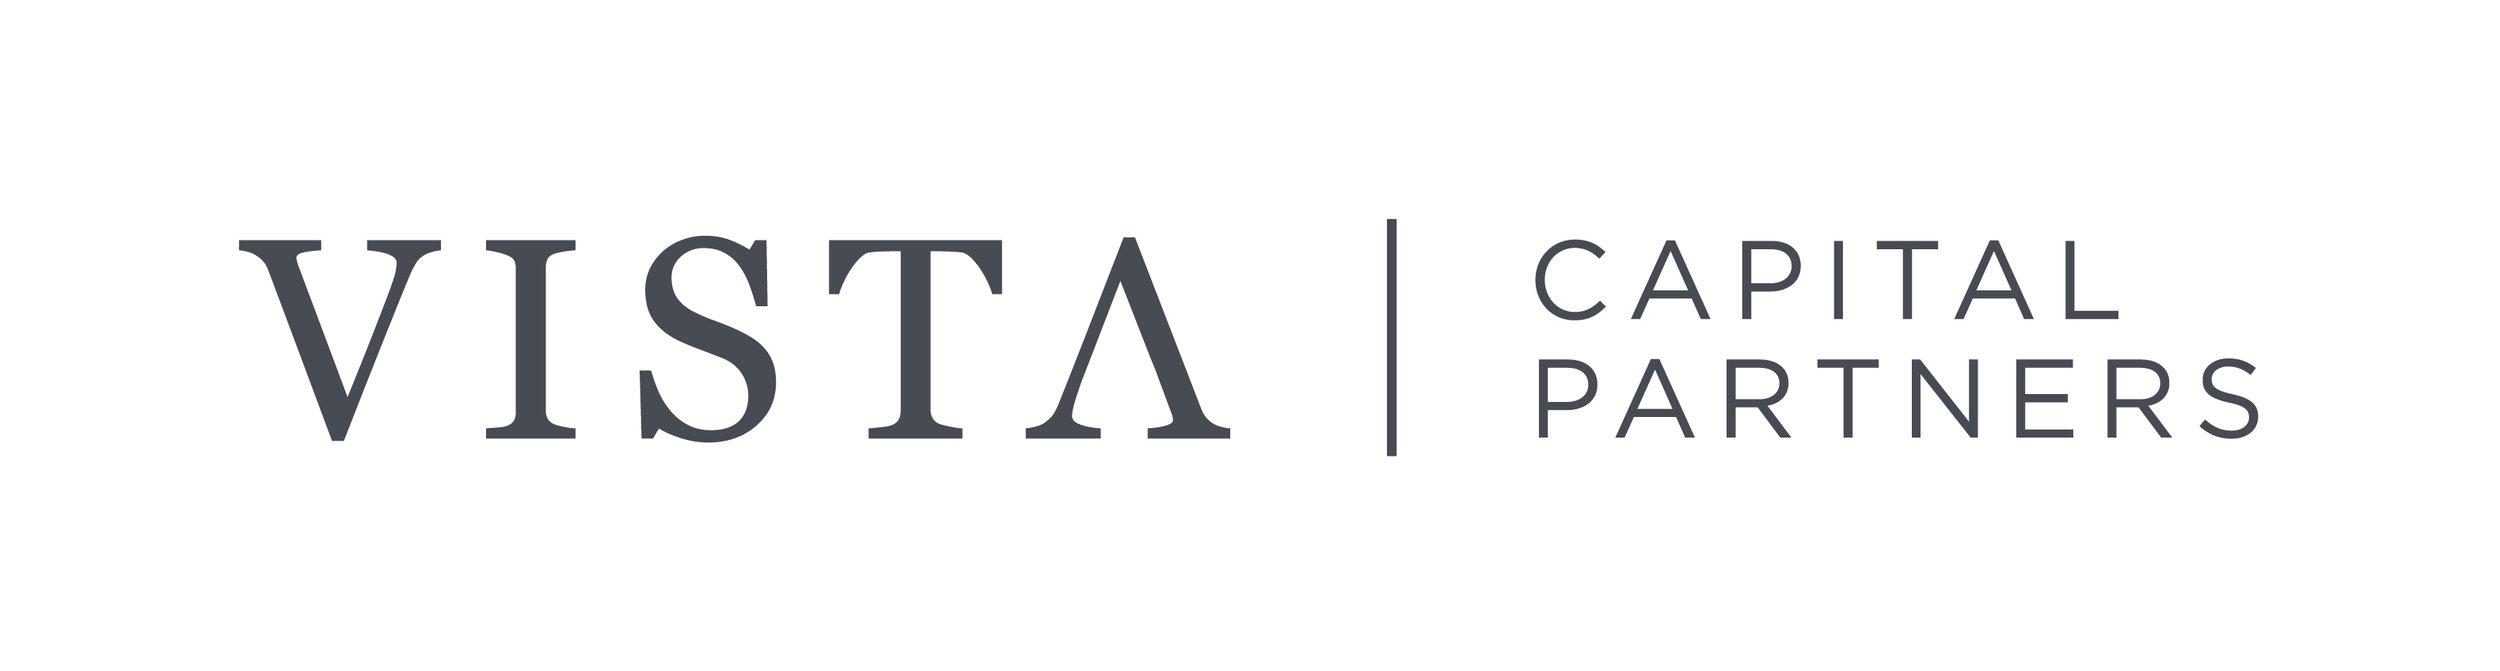 vista-capital-partners-logo-color.jpg